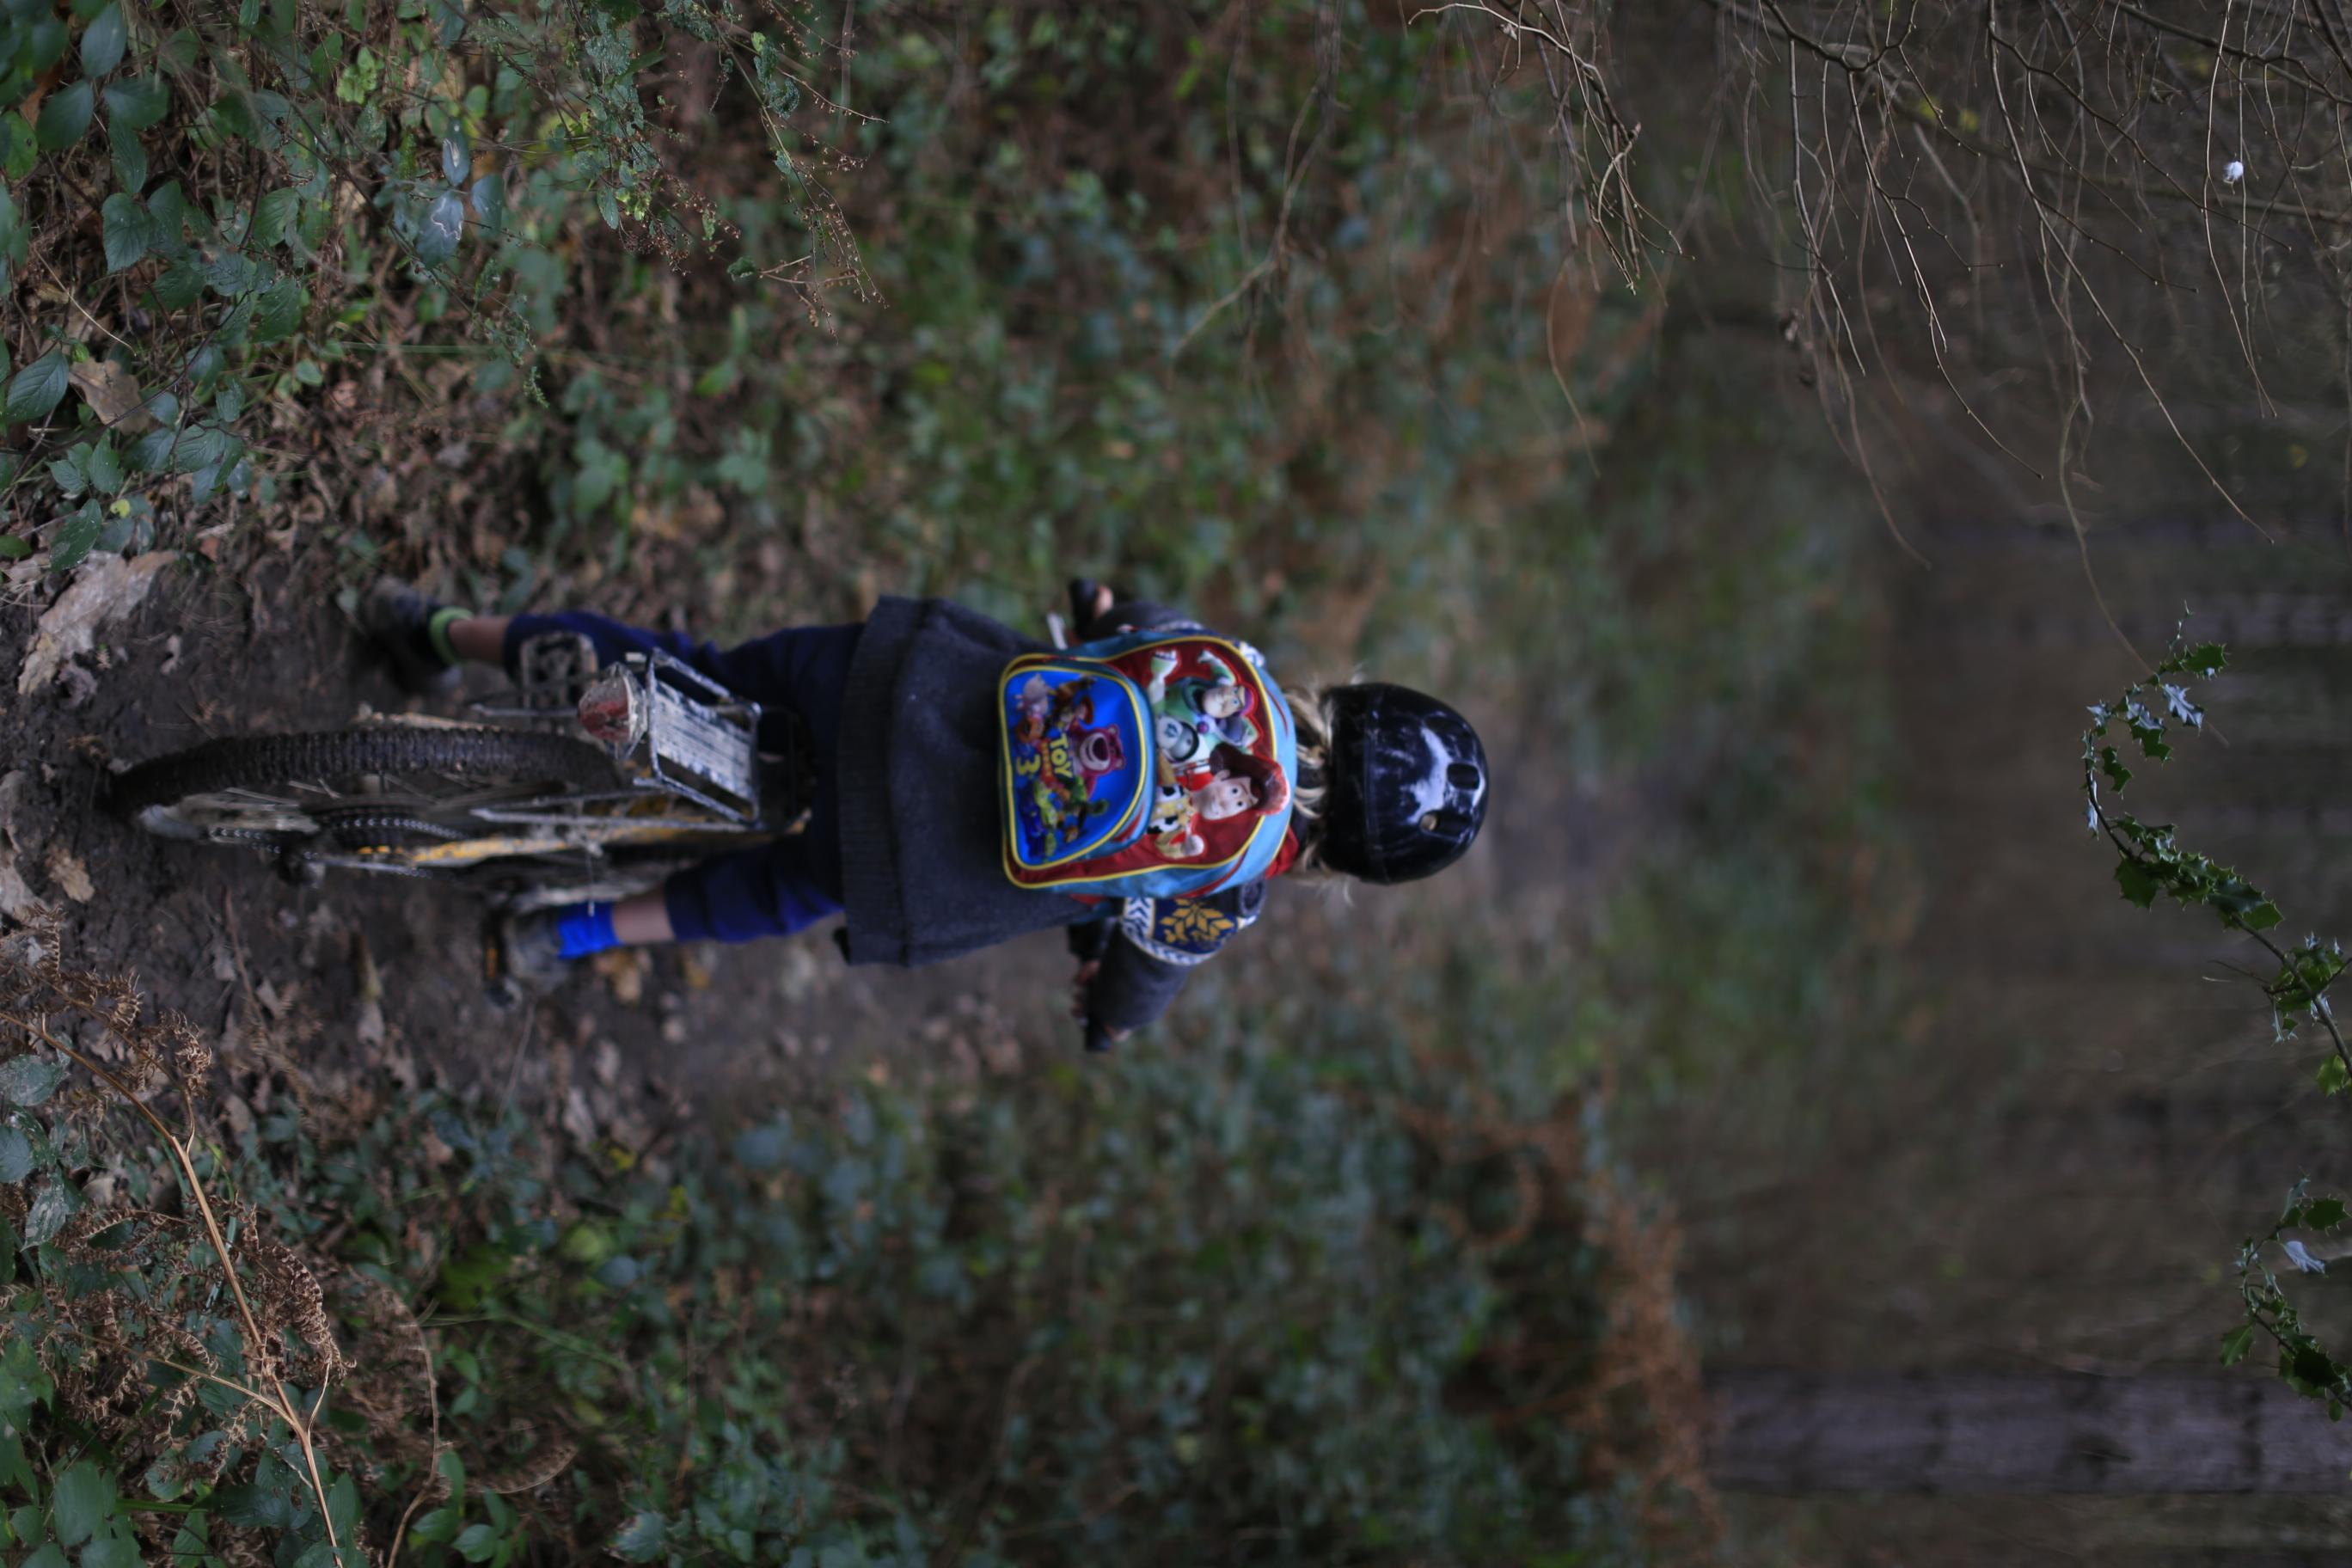 woods, singletrack, mountain biking, bikepacking, photo, photography, canon, canon 6d